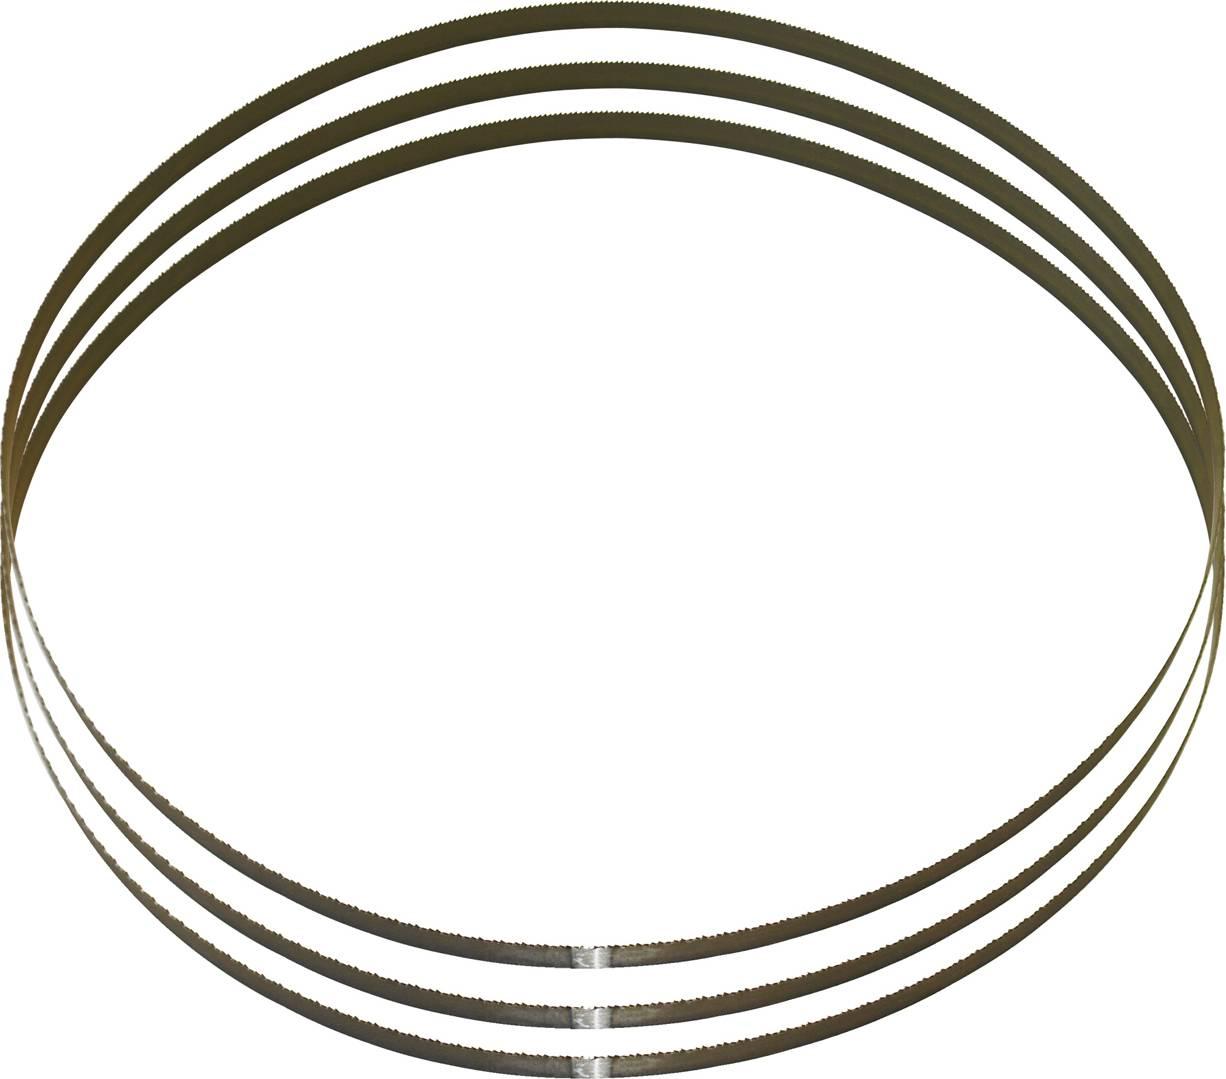 "Pilový pás k pile MBS 125 V, 1.435 x 13 x 0,65 mm (6 z/1"") 40548 GÜDE"